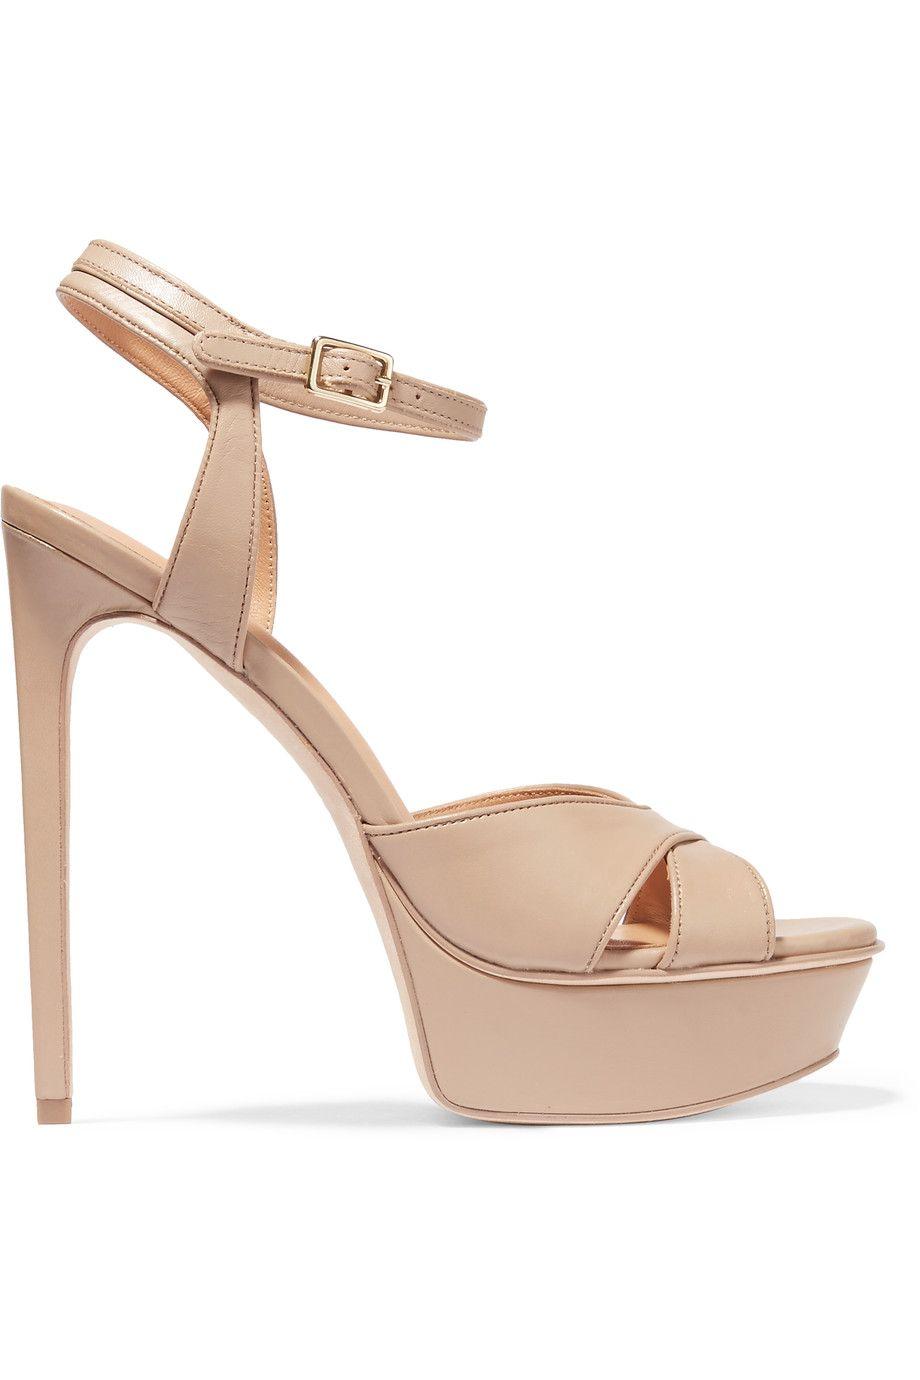 23a7b12203e4 HALSTON HERITAGE Naomi Leather Sandals.  halstonheritage  shoes  sandals